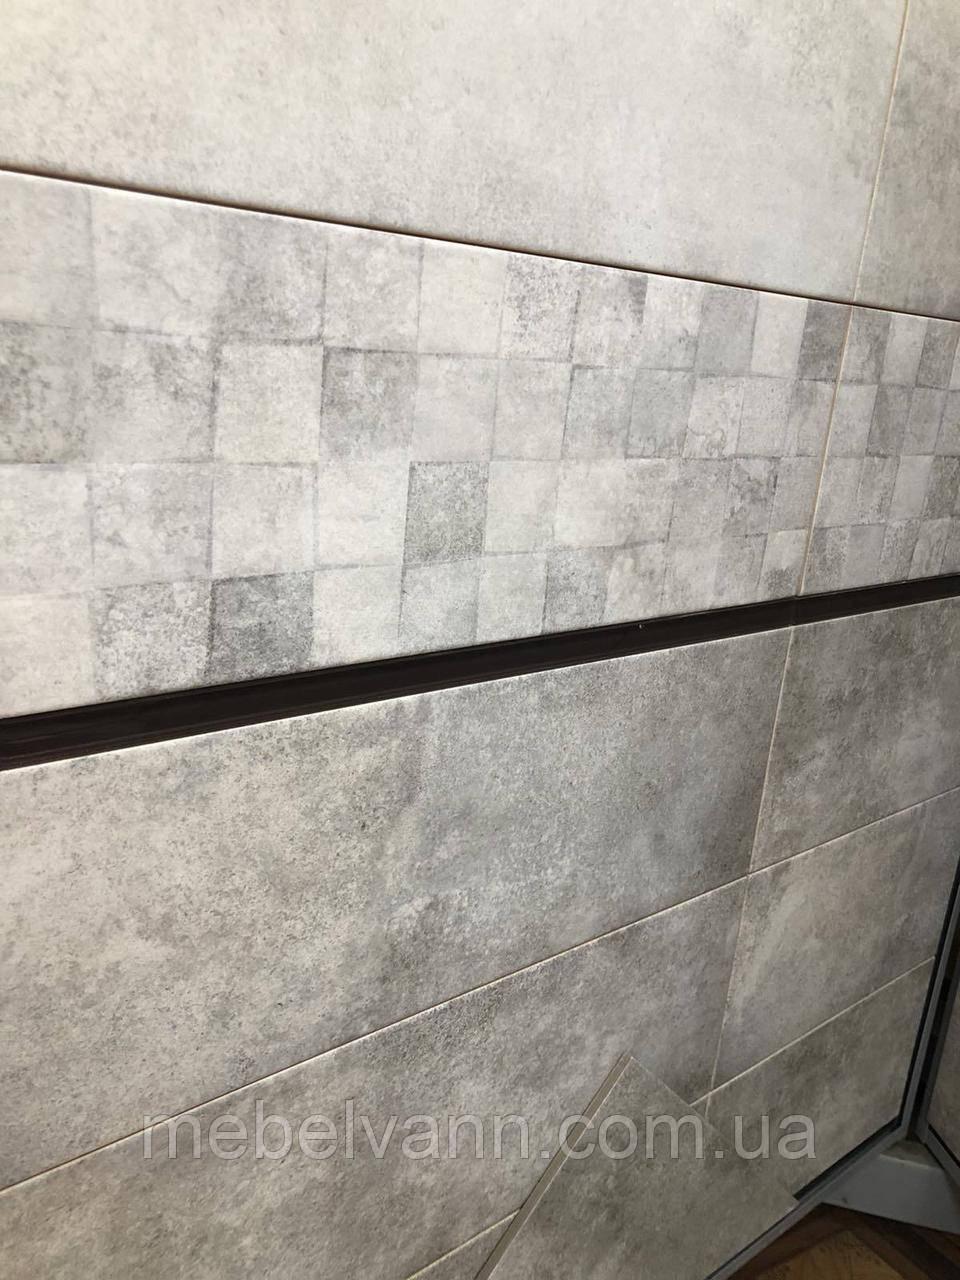 Кафель для ванной Конкрет Стайл (Concrete Style) 20*60 Cersanit